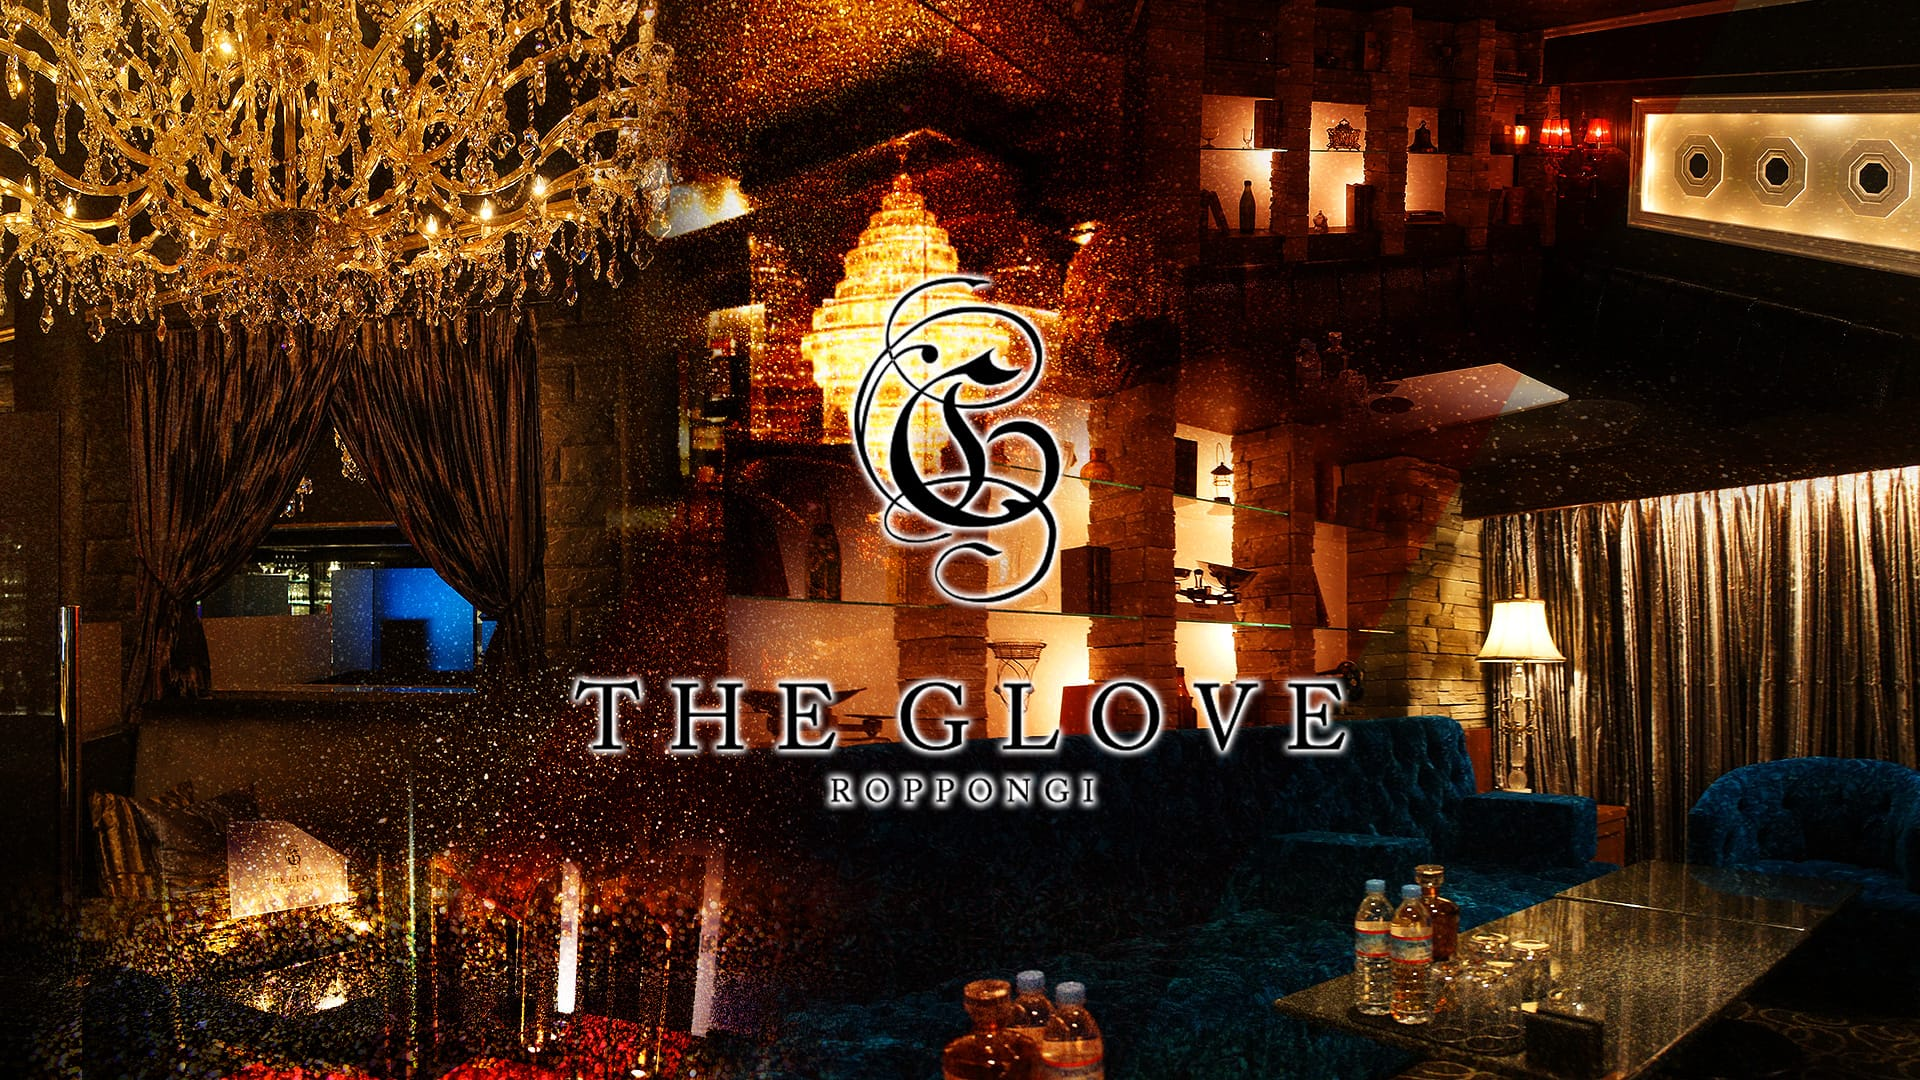 THE GLOVE (ザ・グローブ) 六本木キャバクラ TOP画像